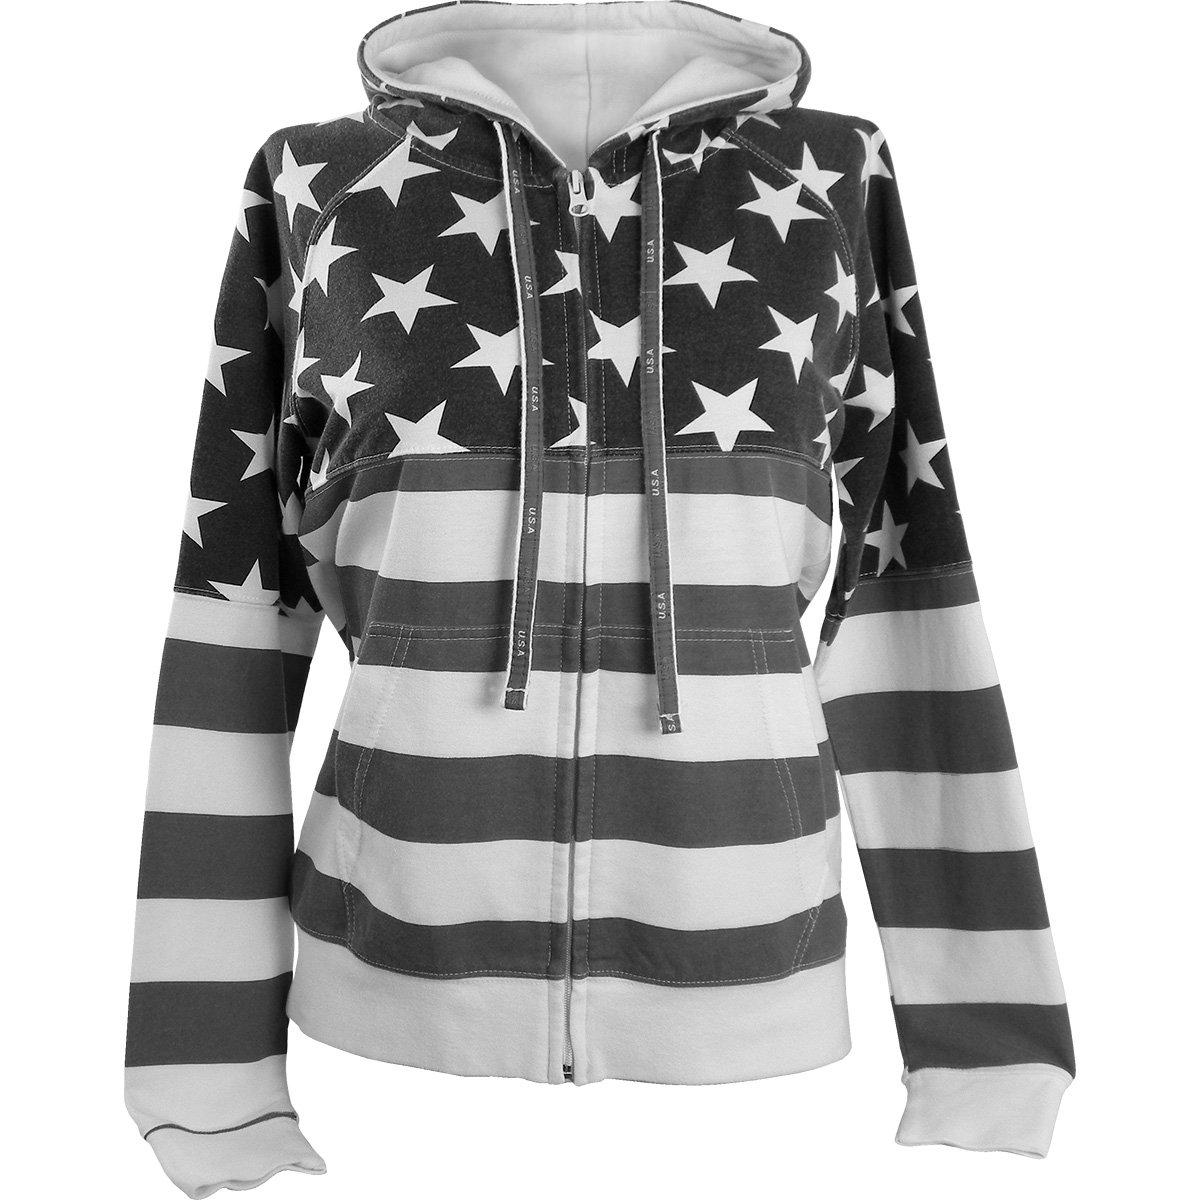 Women's Proud American Flag Sweatshirt 4009 Grey XL